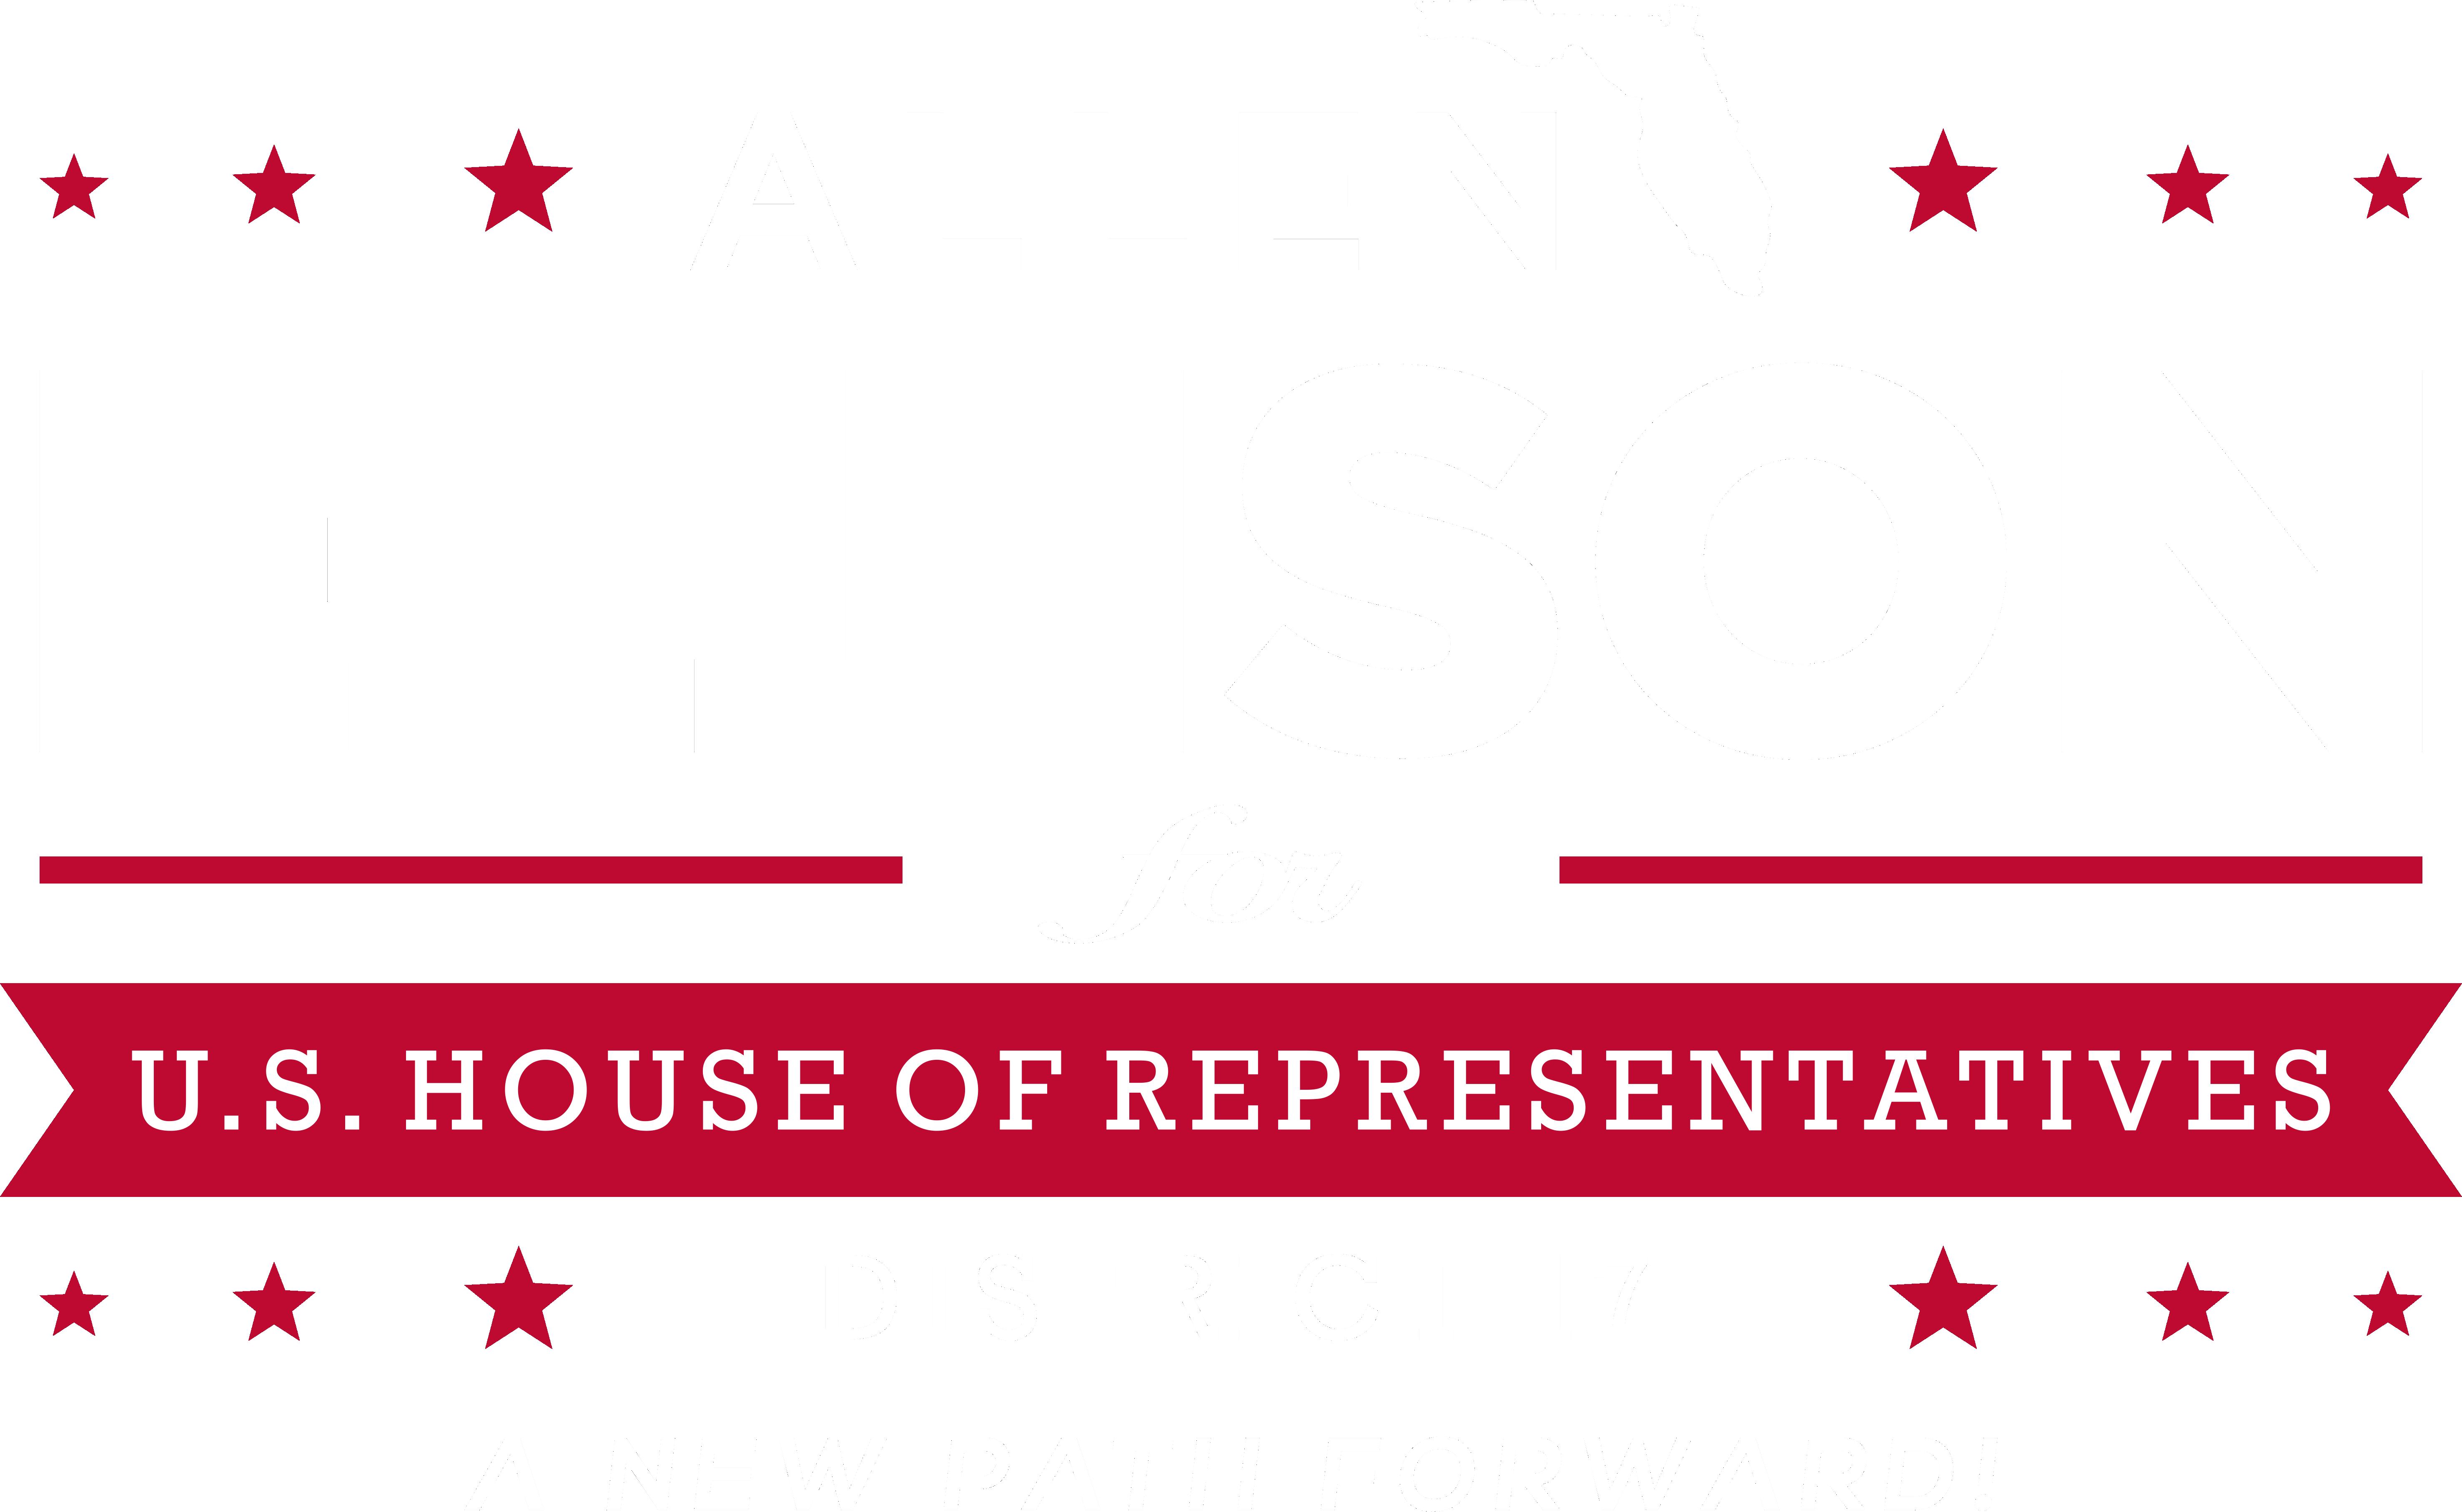 Allen Ellison